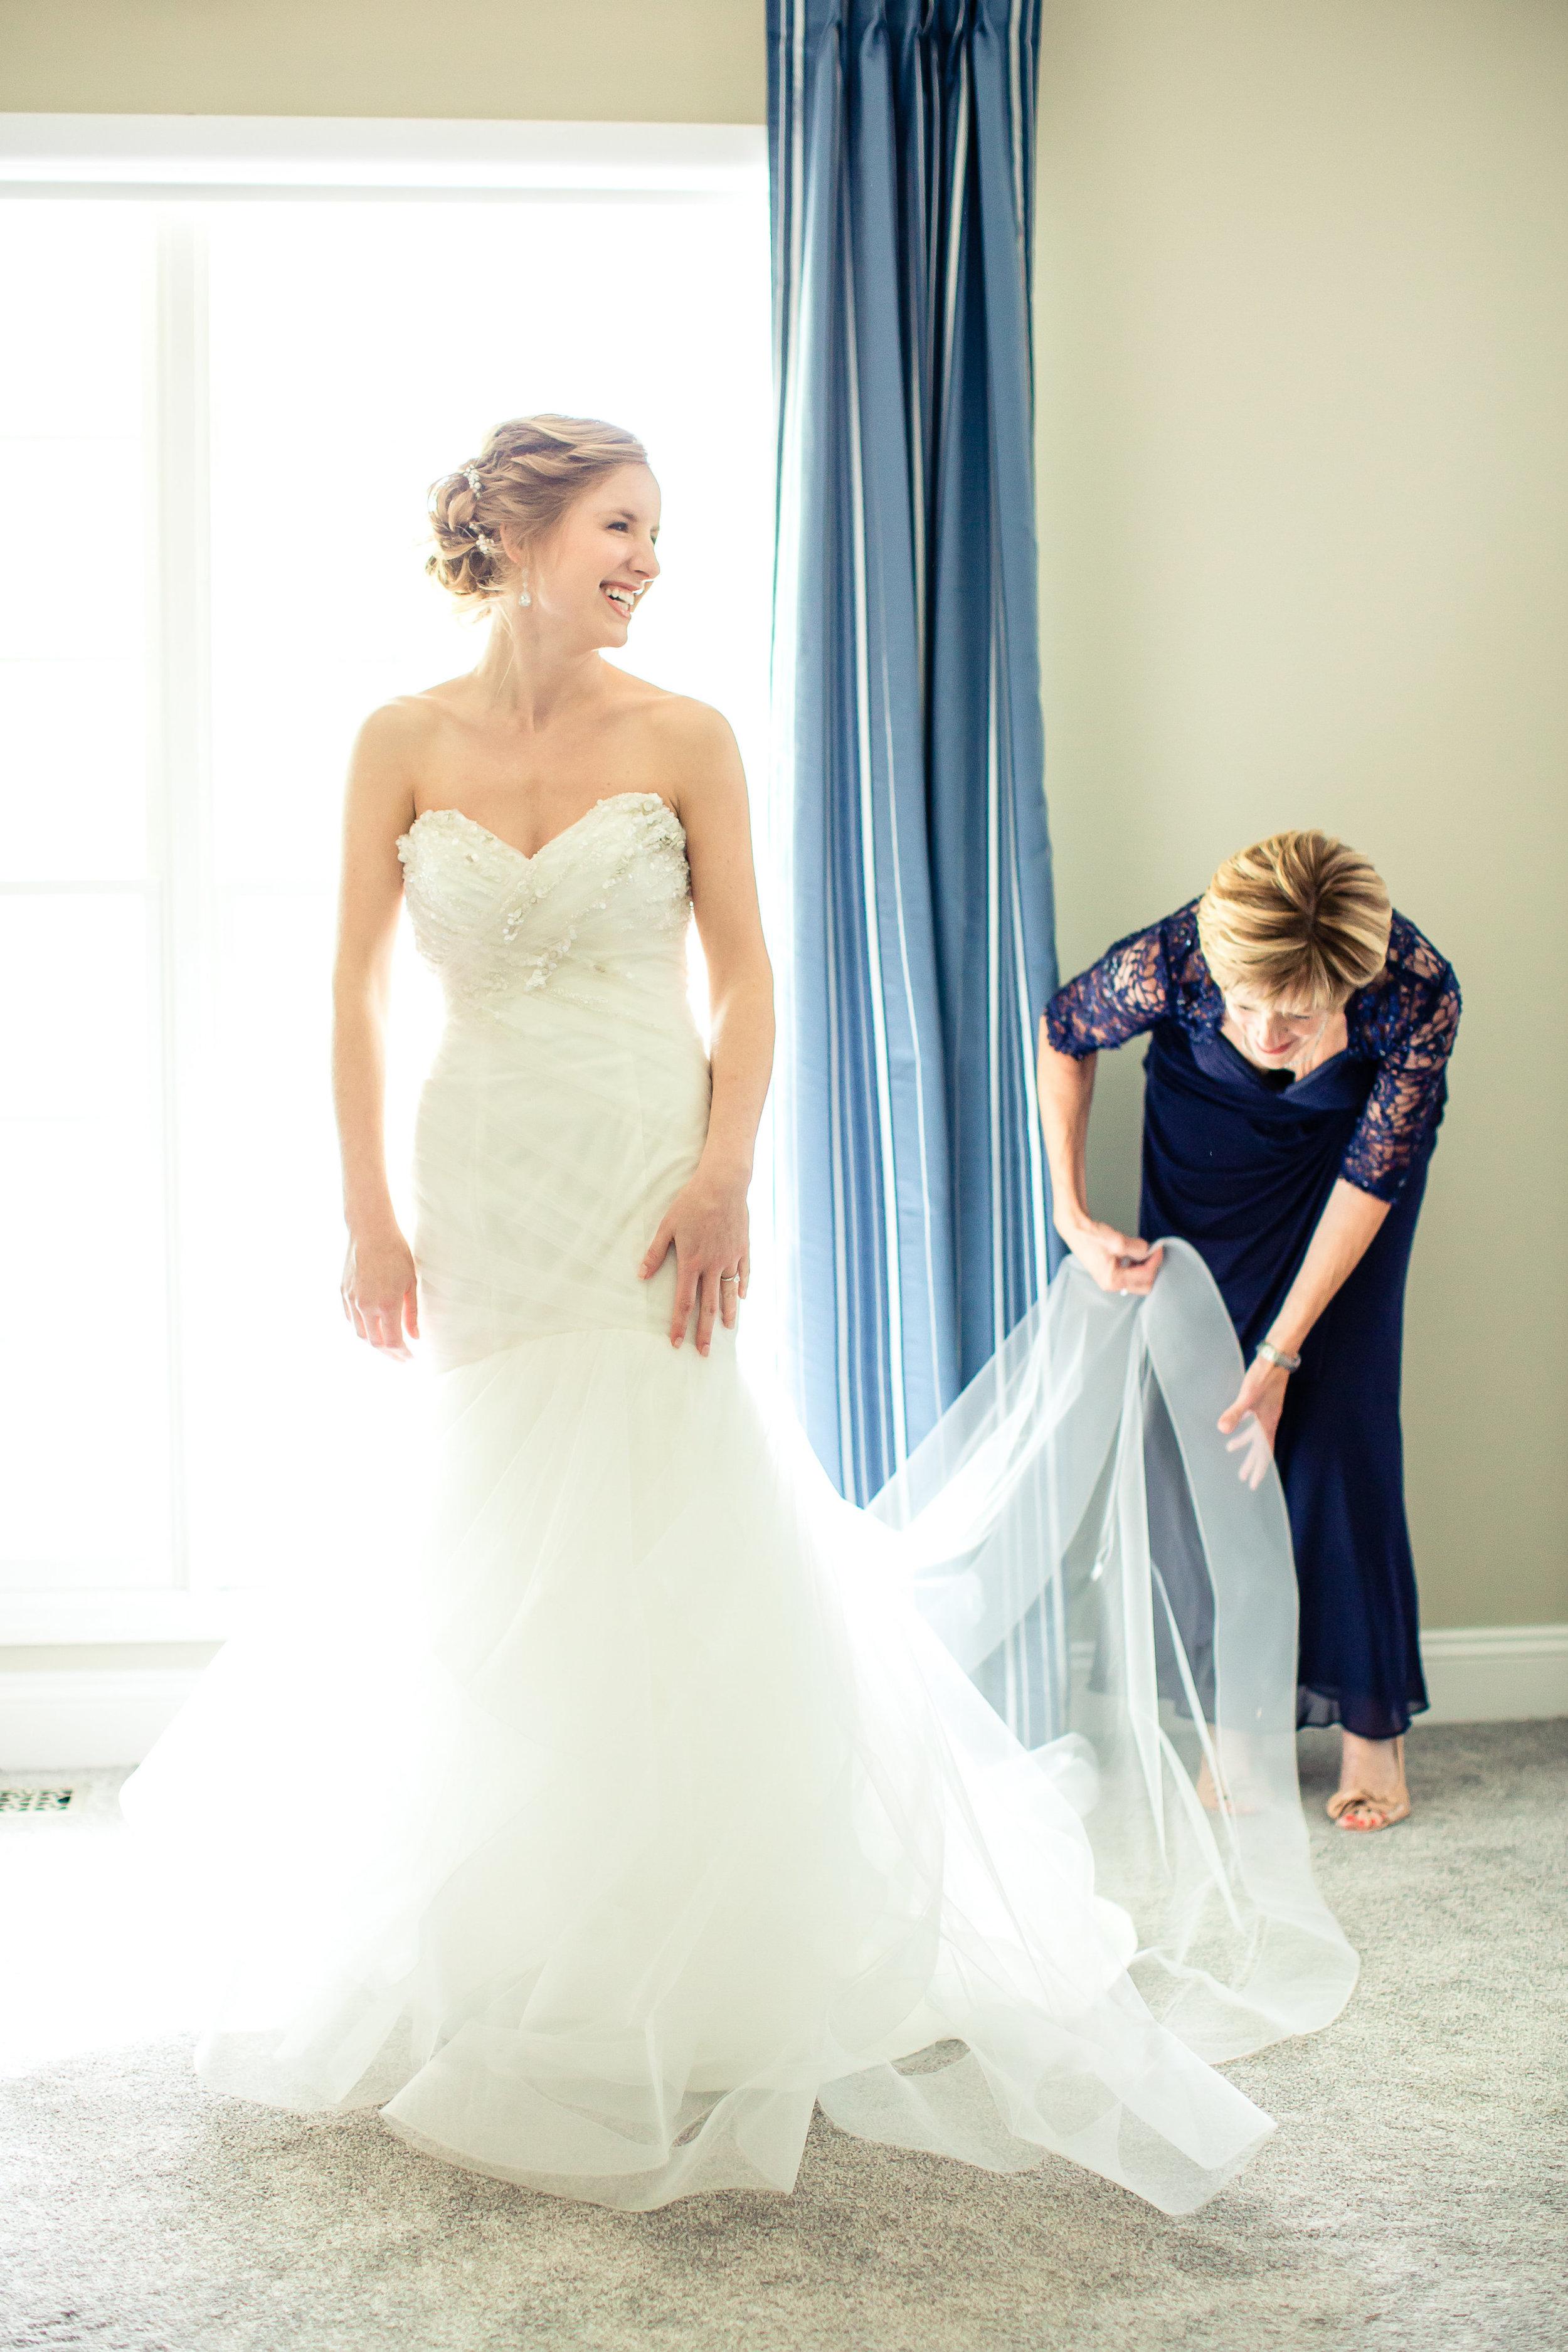 St. Louis Wedding Photographer Oldani Photography Getting Ready 8.jpg